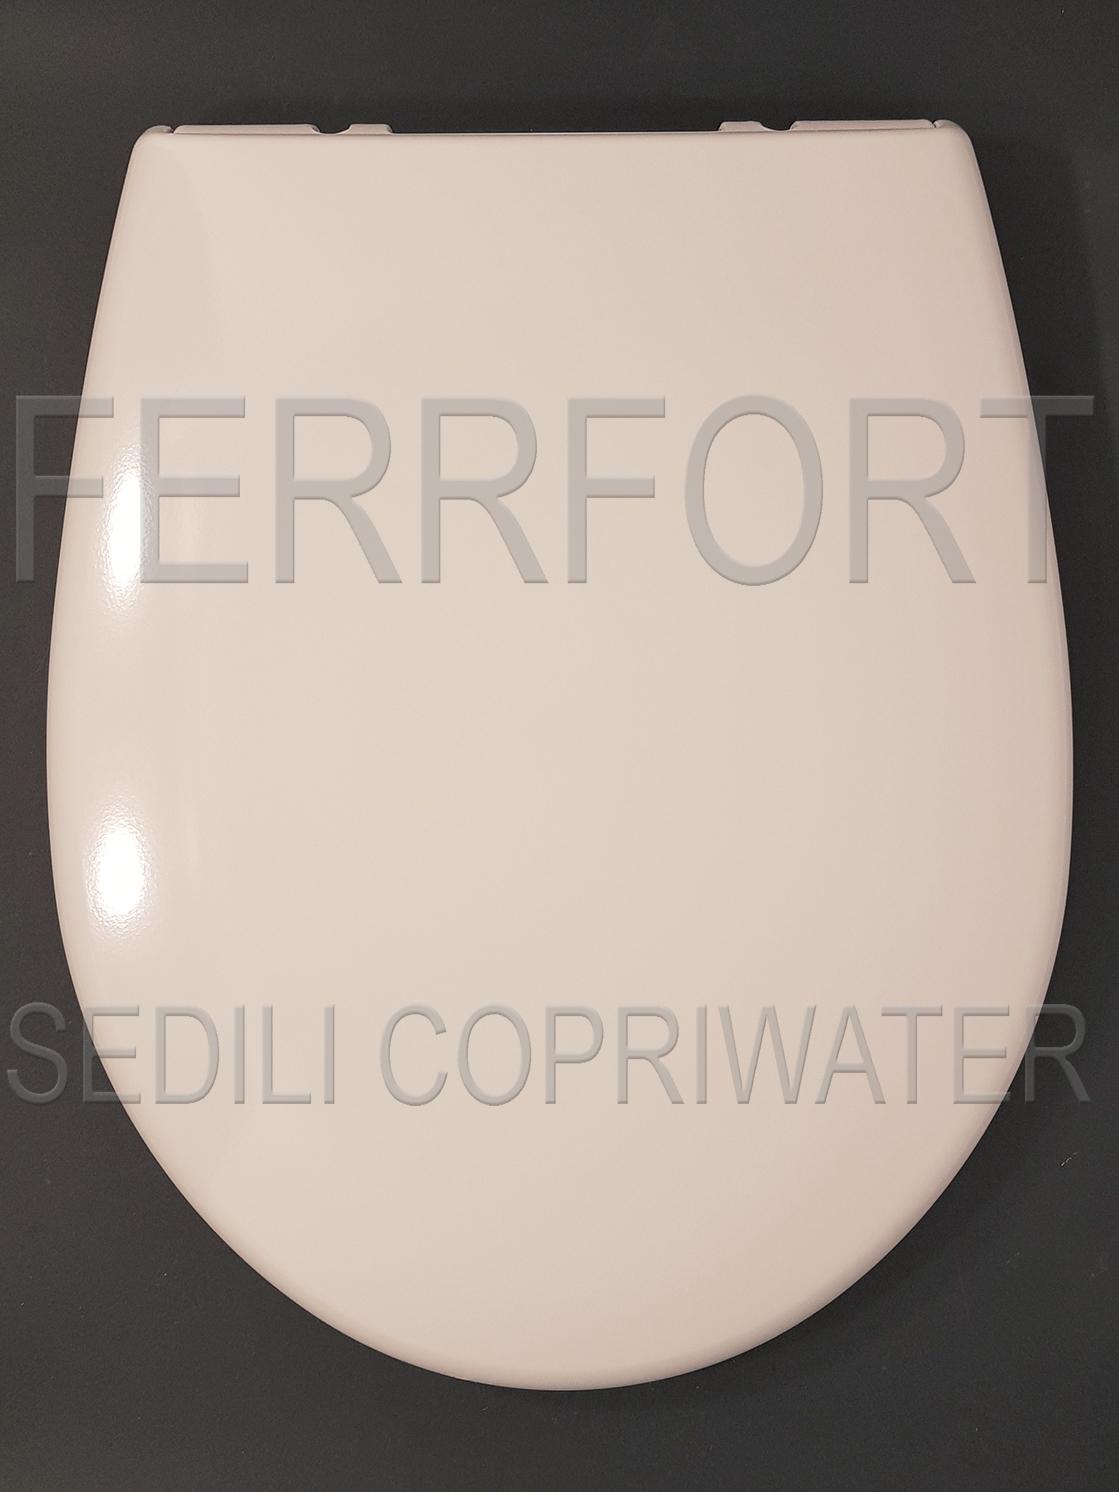 SEDILE COPRIWATER TERMOINDURENTE DUROPLAST BOWL+50/55 GLOBO BIANCO